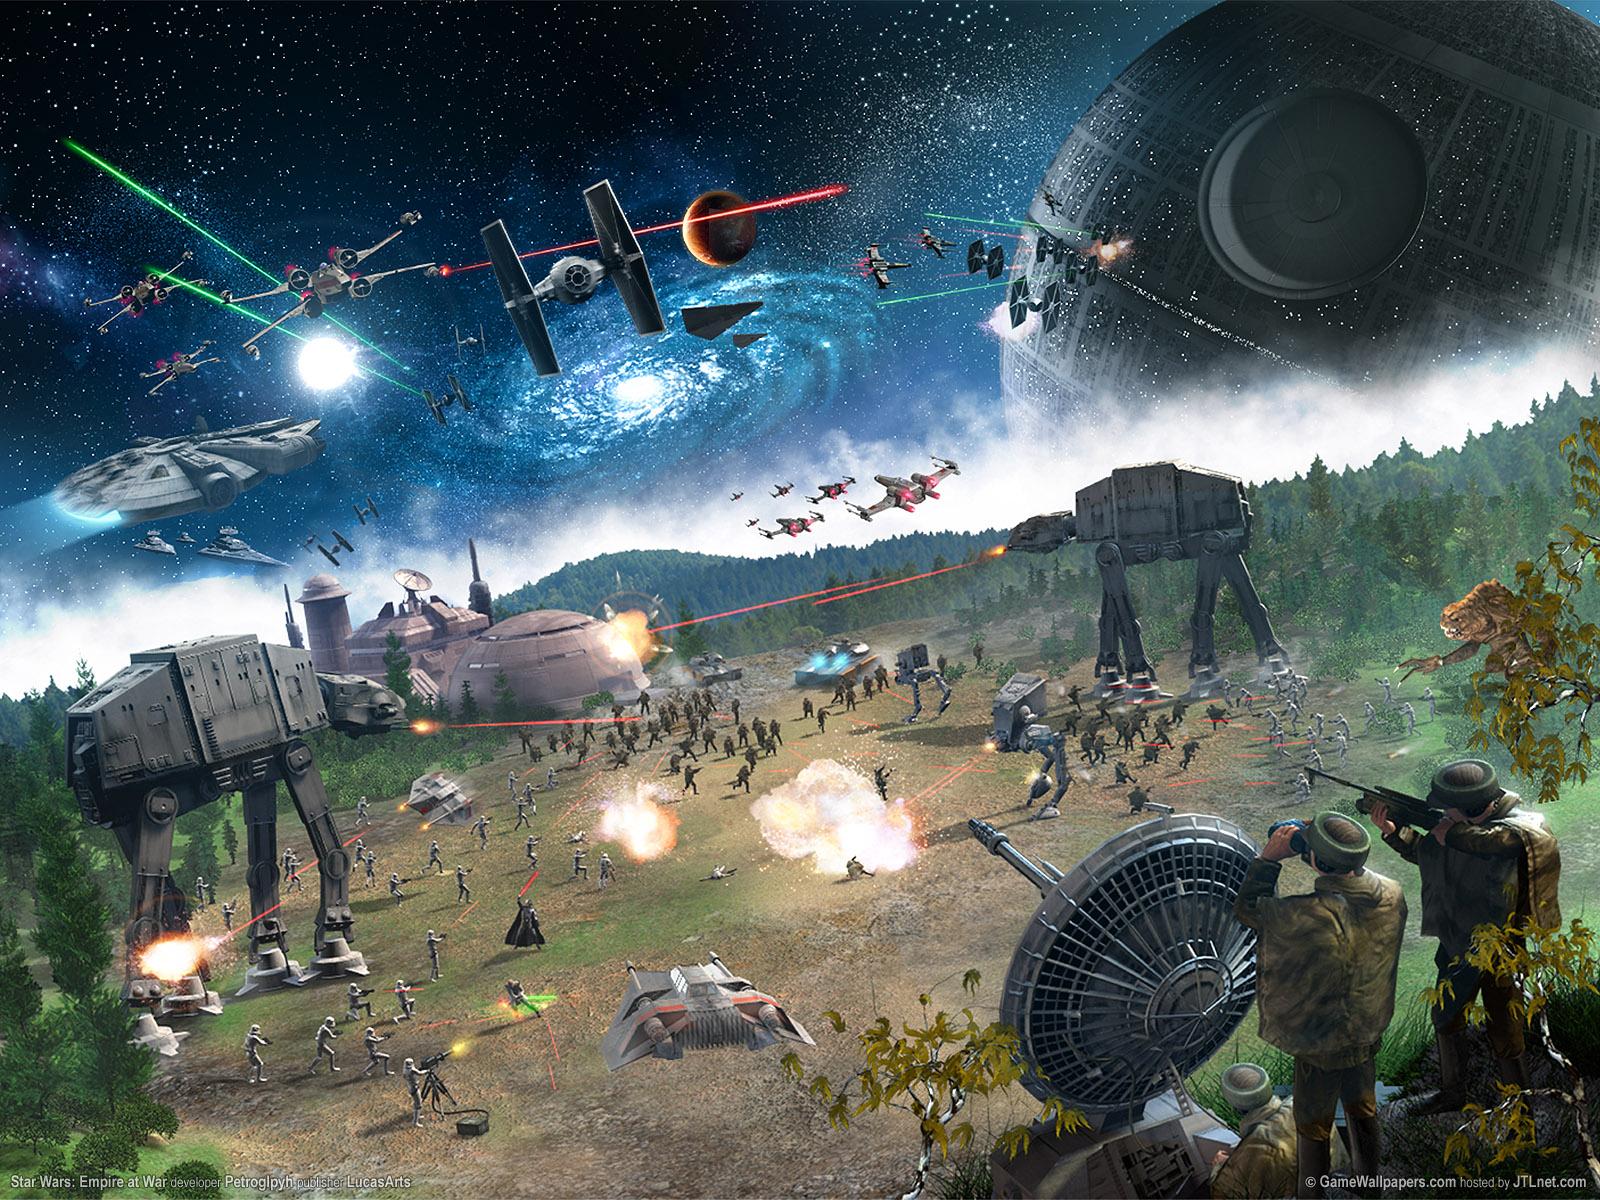 1600x1200 Star Wars Empire at War desktop PC and Mac wallpaper 1600x1200